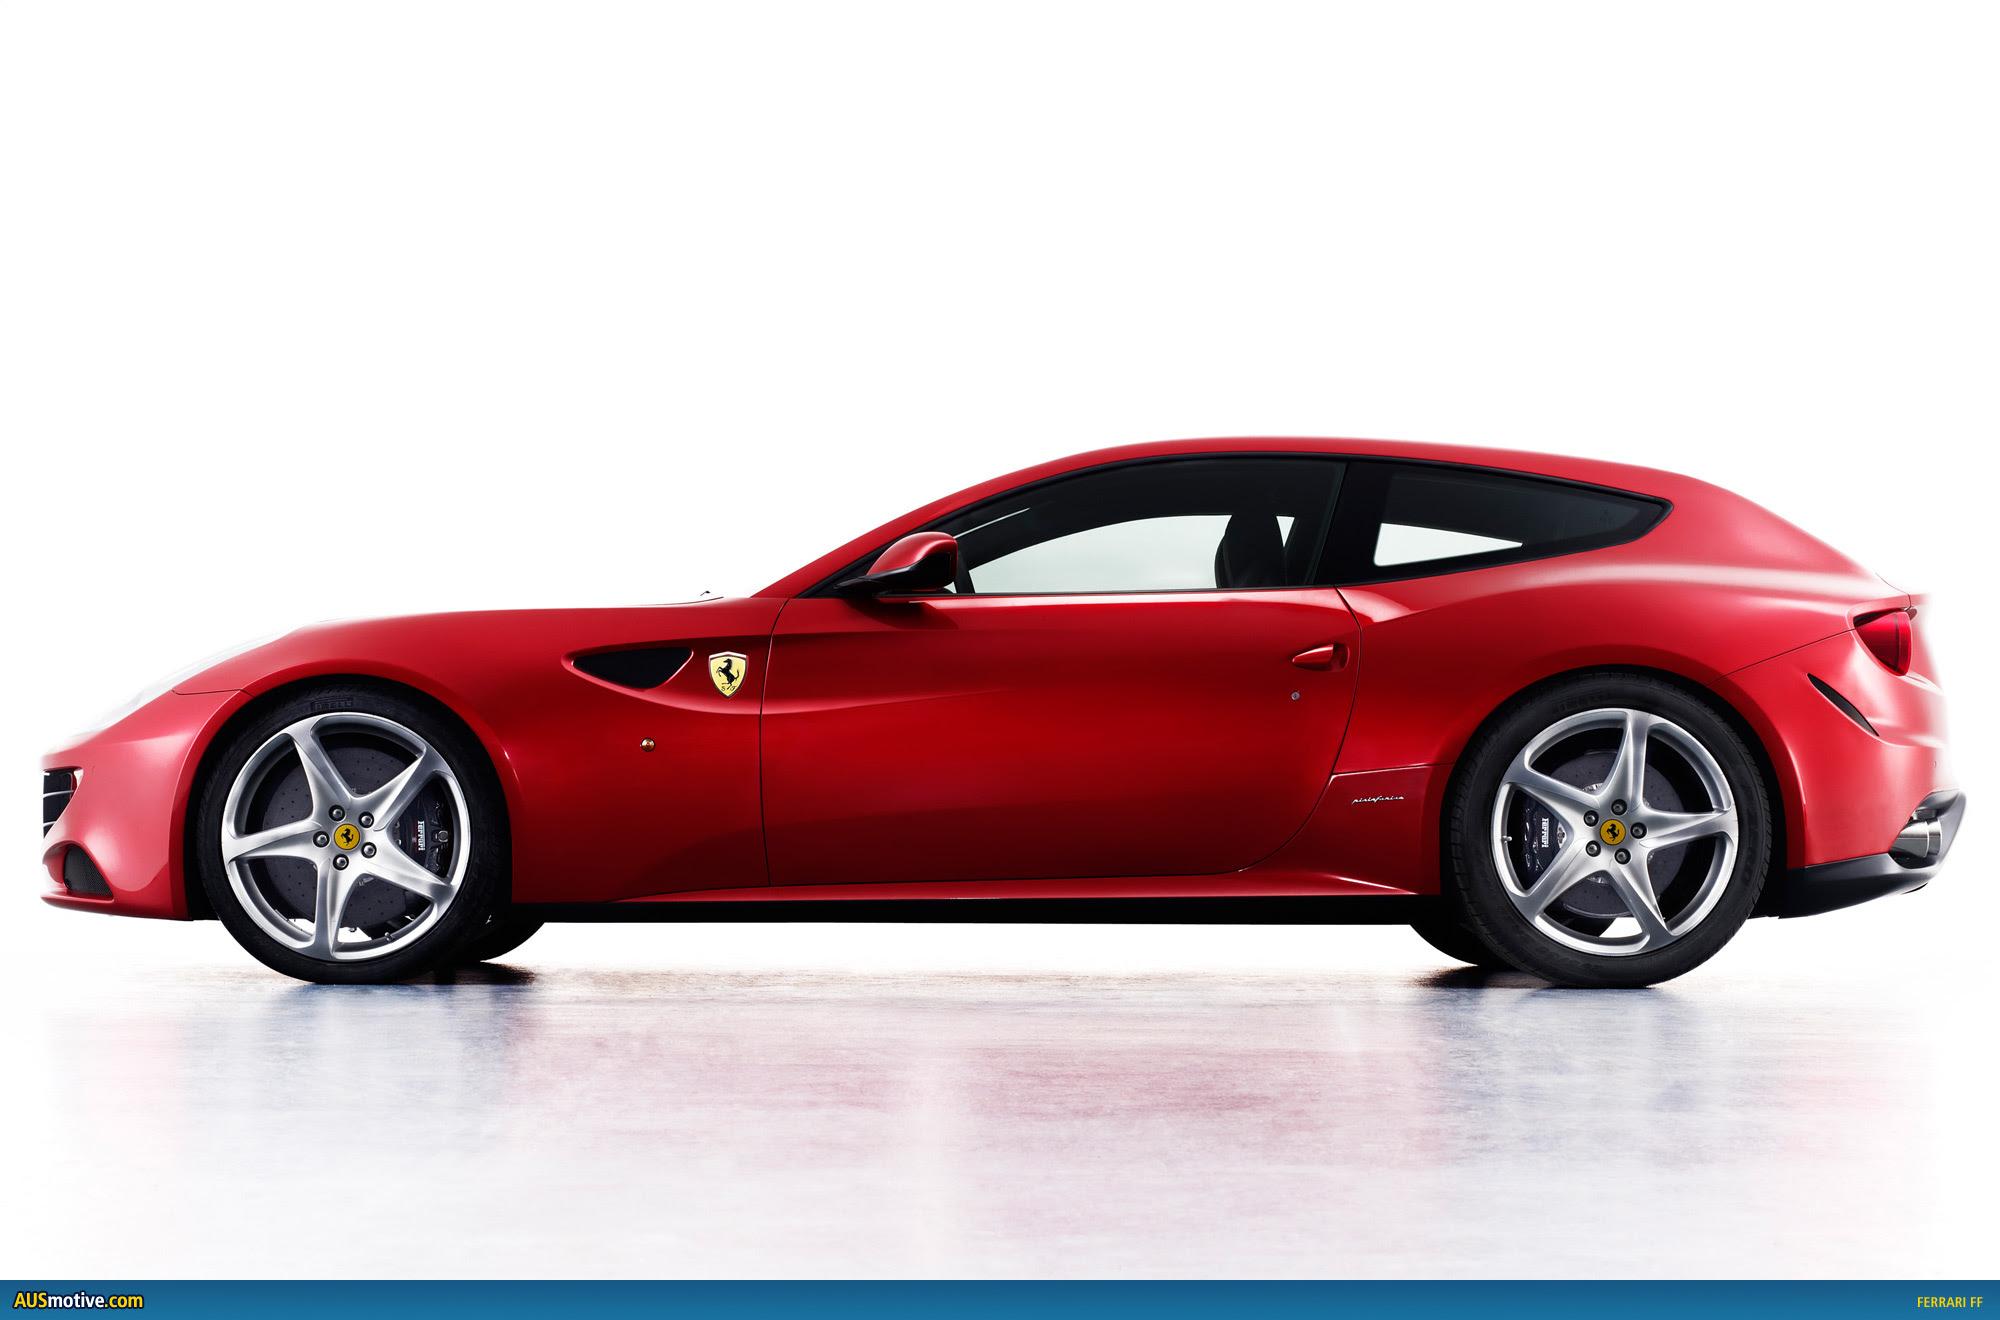 AUSmotive.com » Ferrari FF gets on the four seater wagon